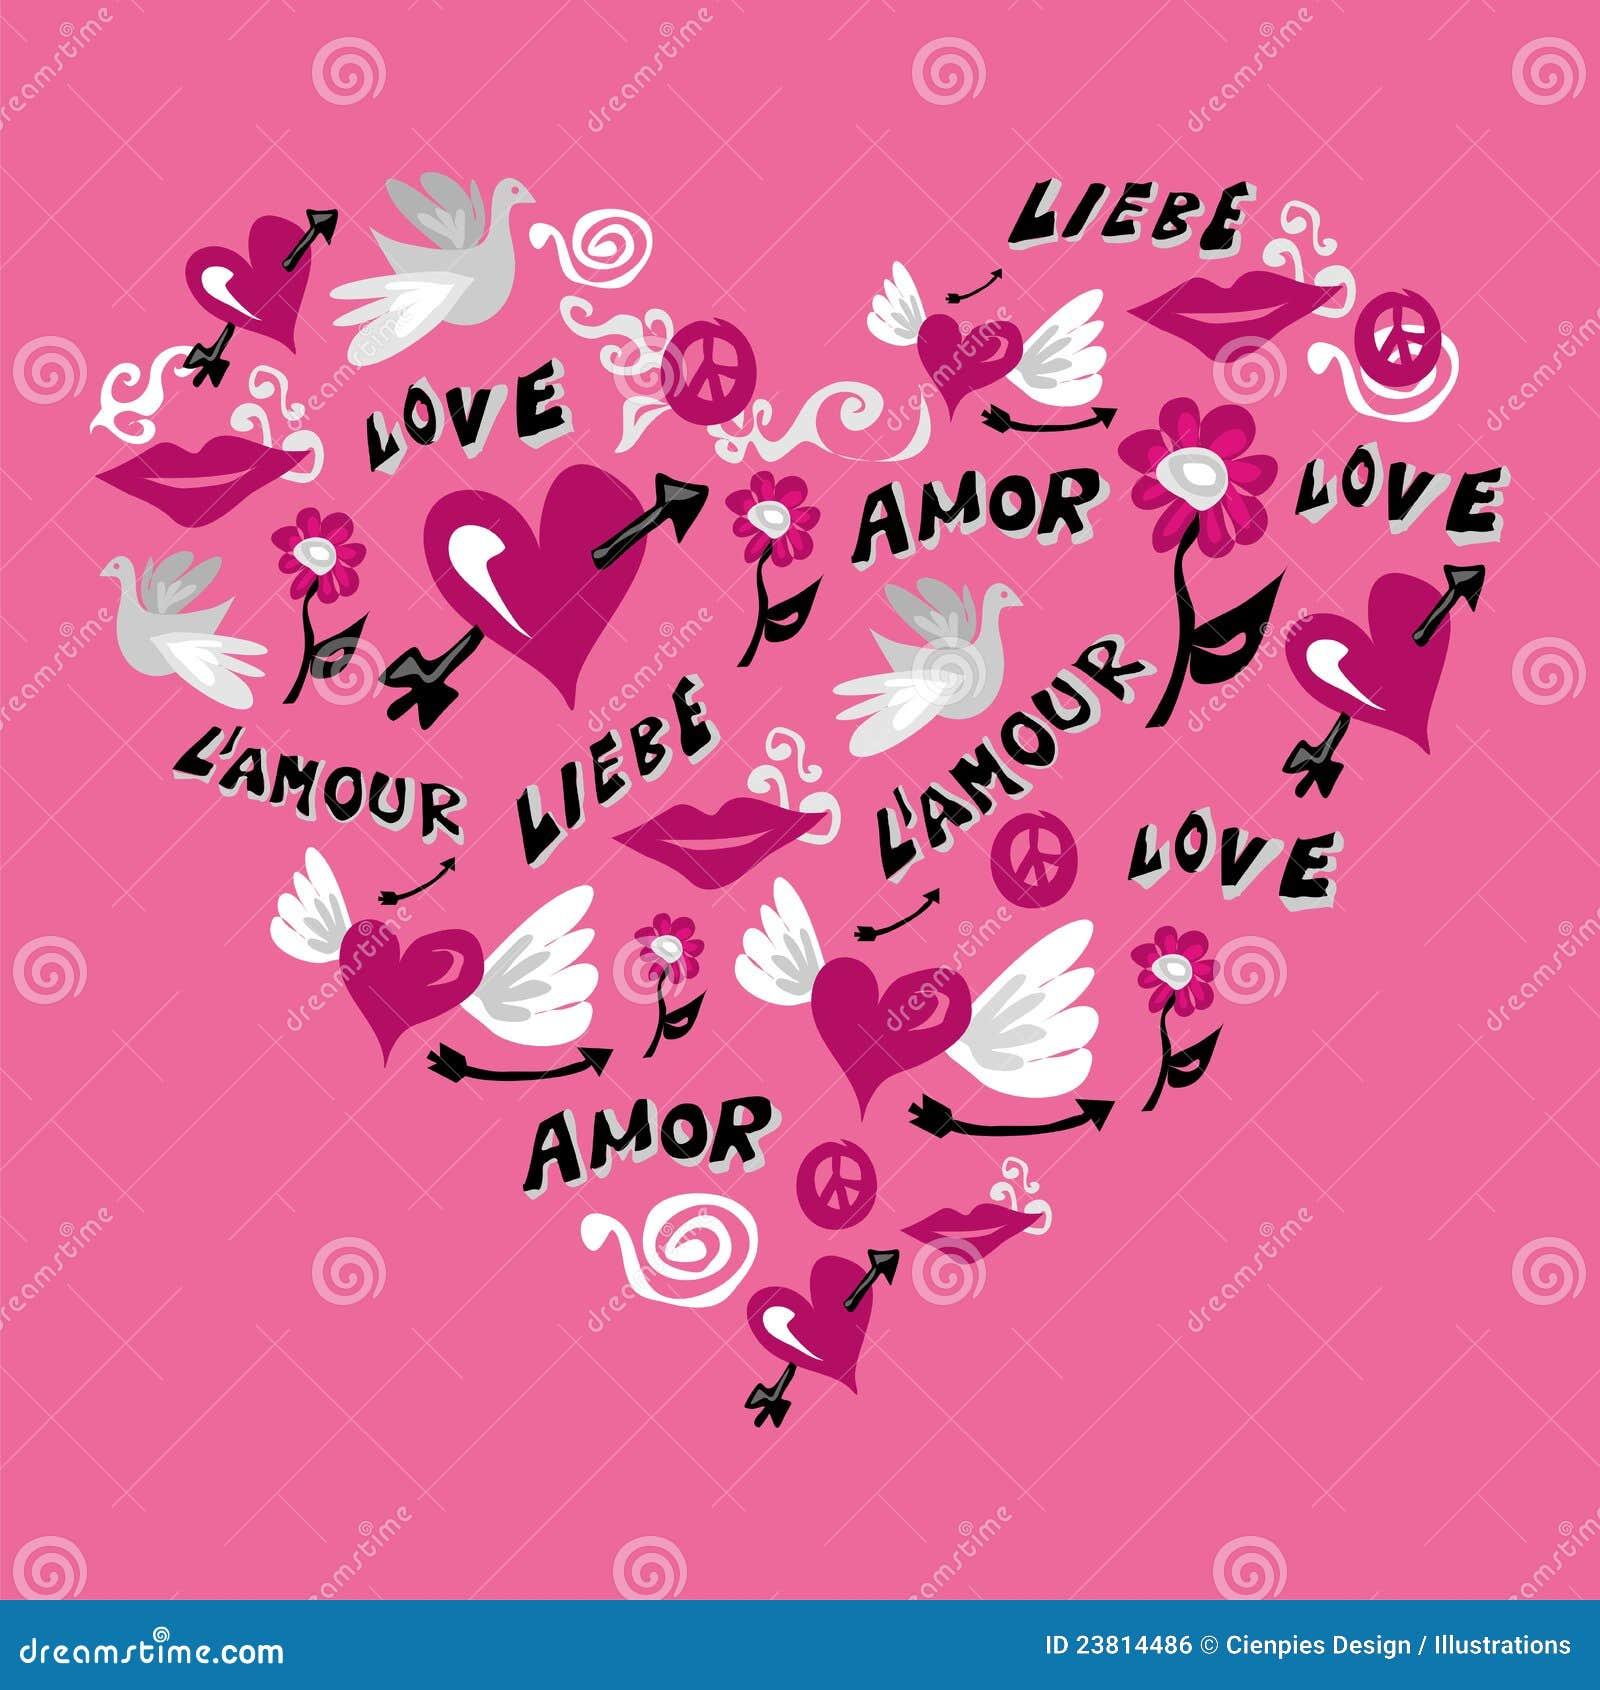 Love symbols in heart shape stock vector illustration of love symbols in heart shape buycottarizona Gallery